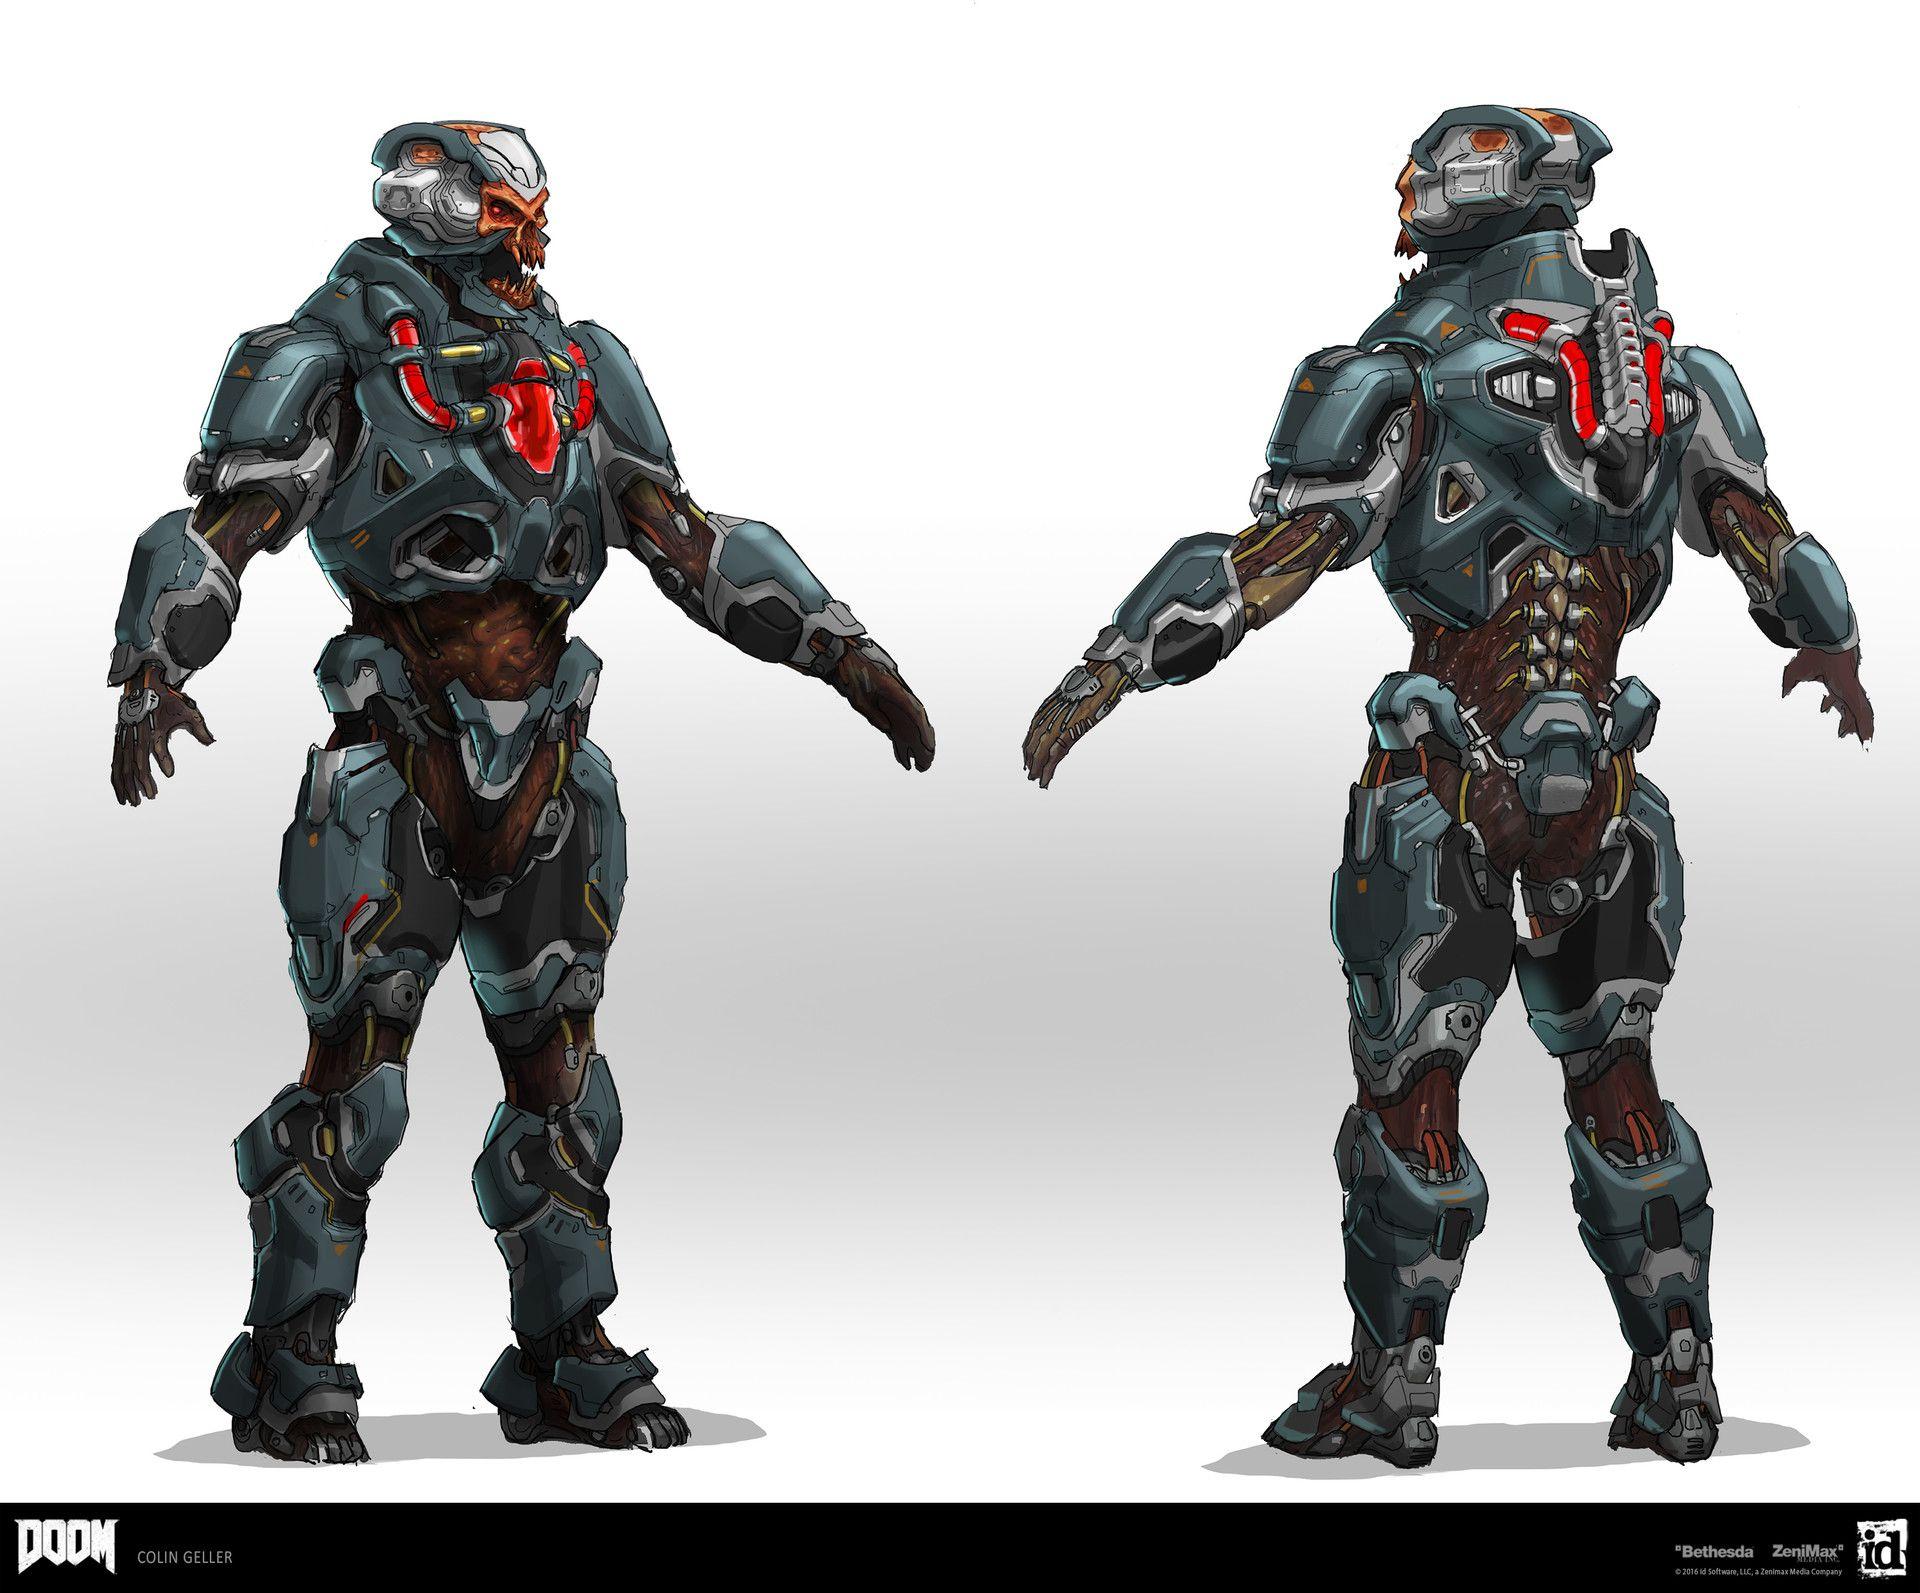 ArtStation - DOOM - DLC Cyber Demonic Armor, Colin Geller